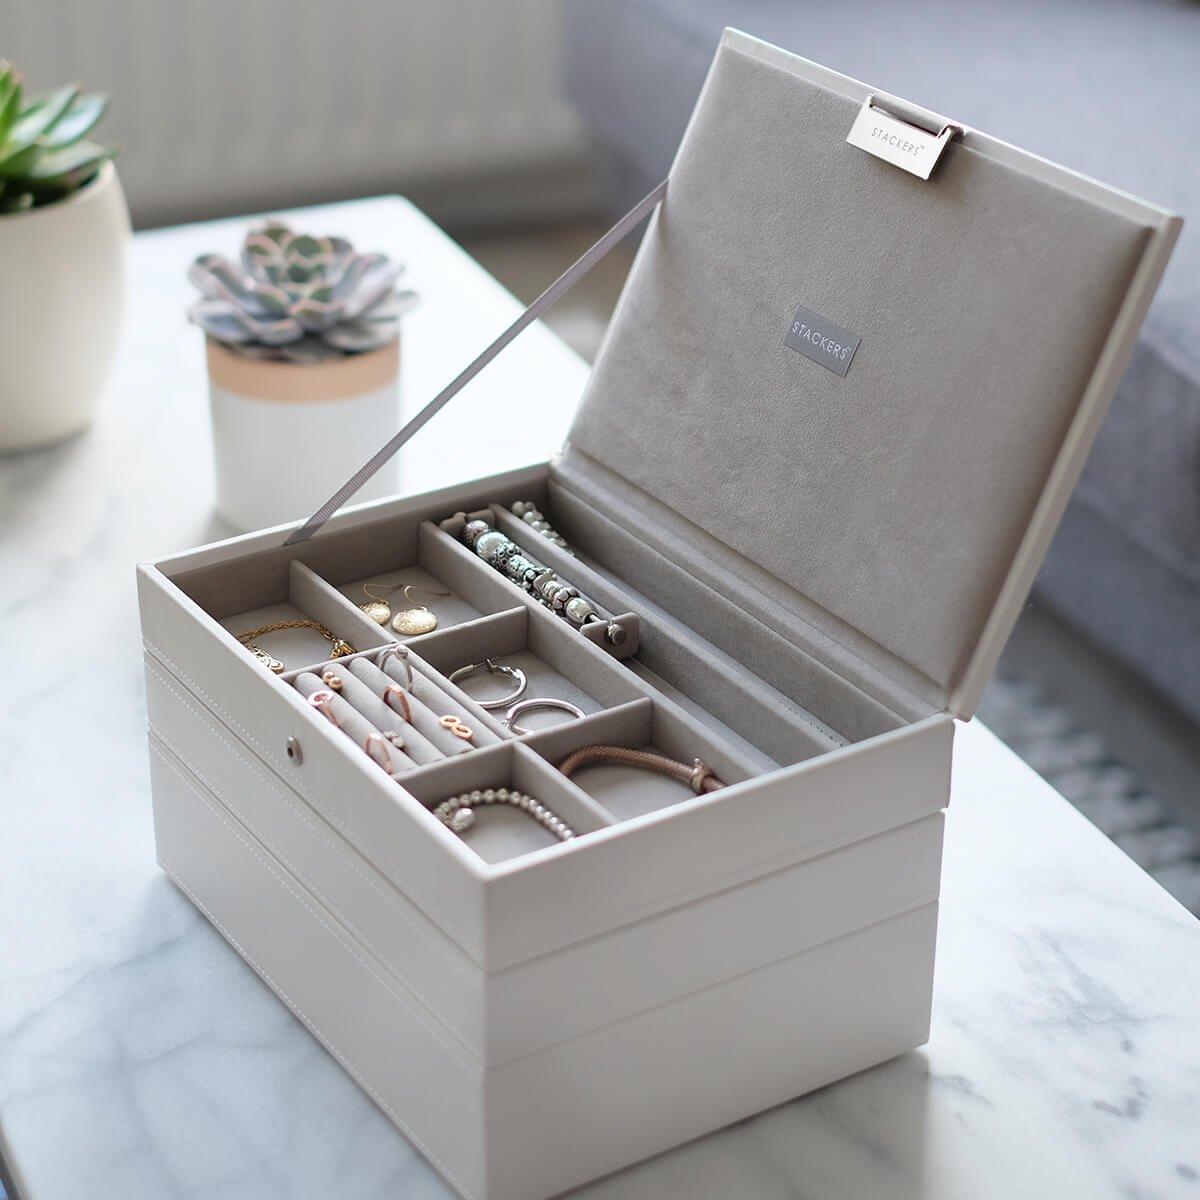 Stackers Classic Size Caja De La Joyer A Organizador Con 4  ~ Organizador De Joyas Para Cajones